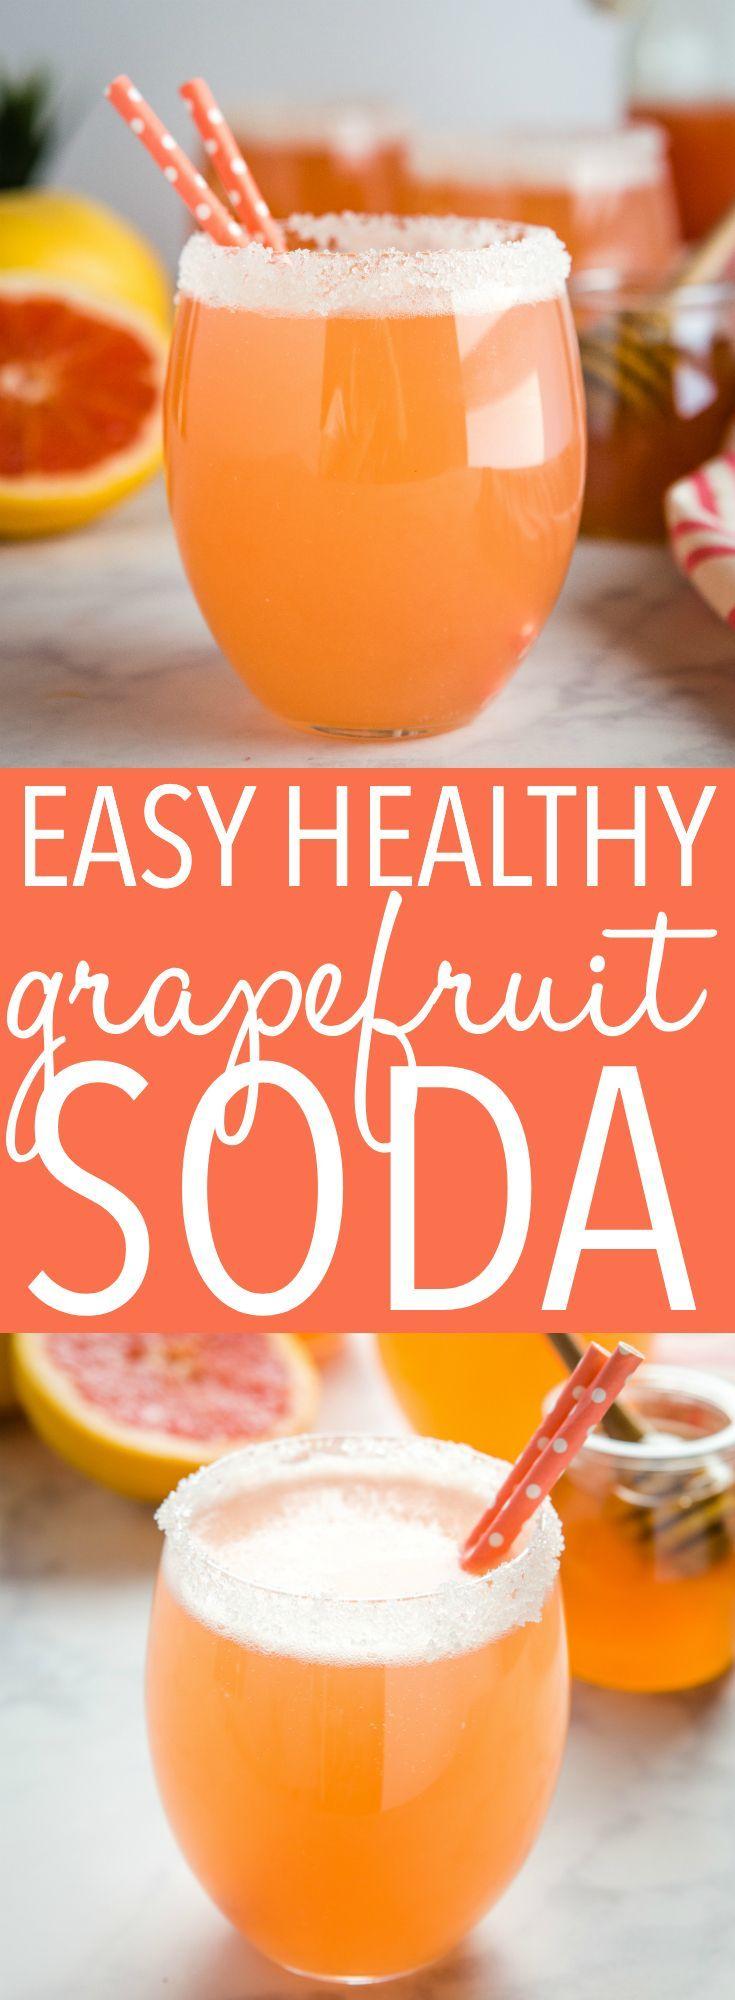 Easy Healthy Grapefruit Soda #nonalcoholicsummerdrinks